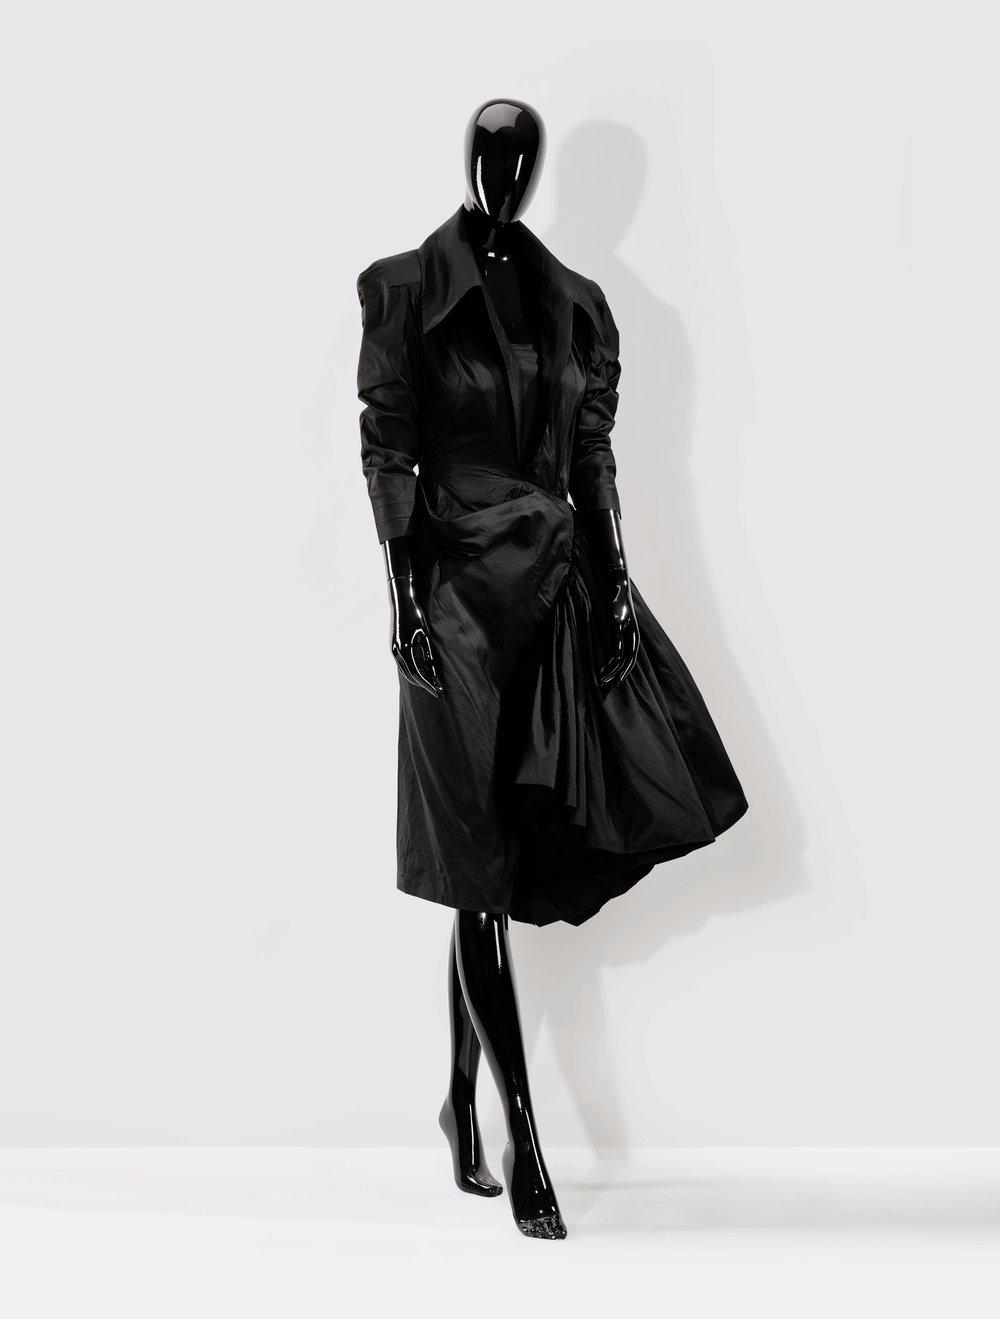 Christian Dior - 1950  A pin-taffeta gown  Estimate: €2,000-3,000